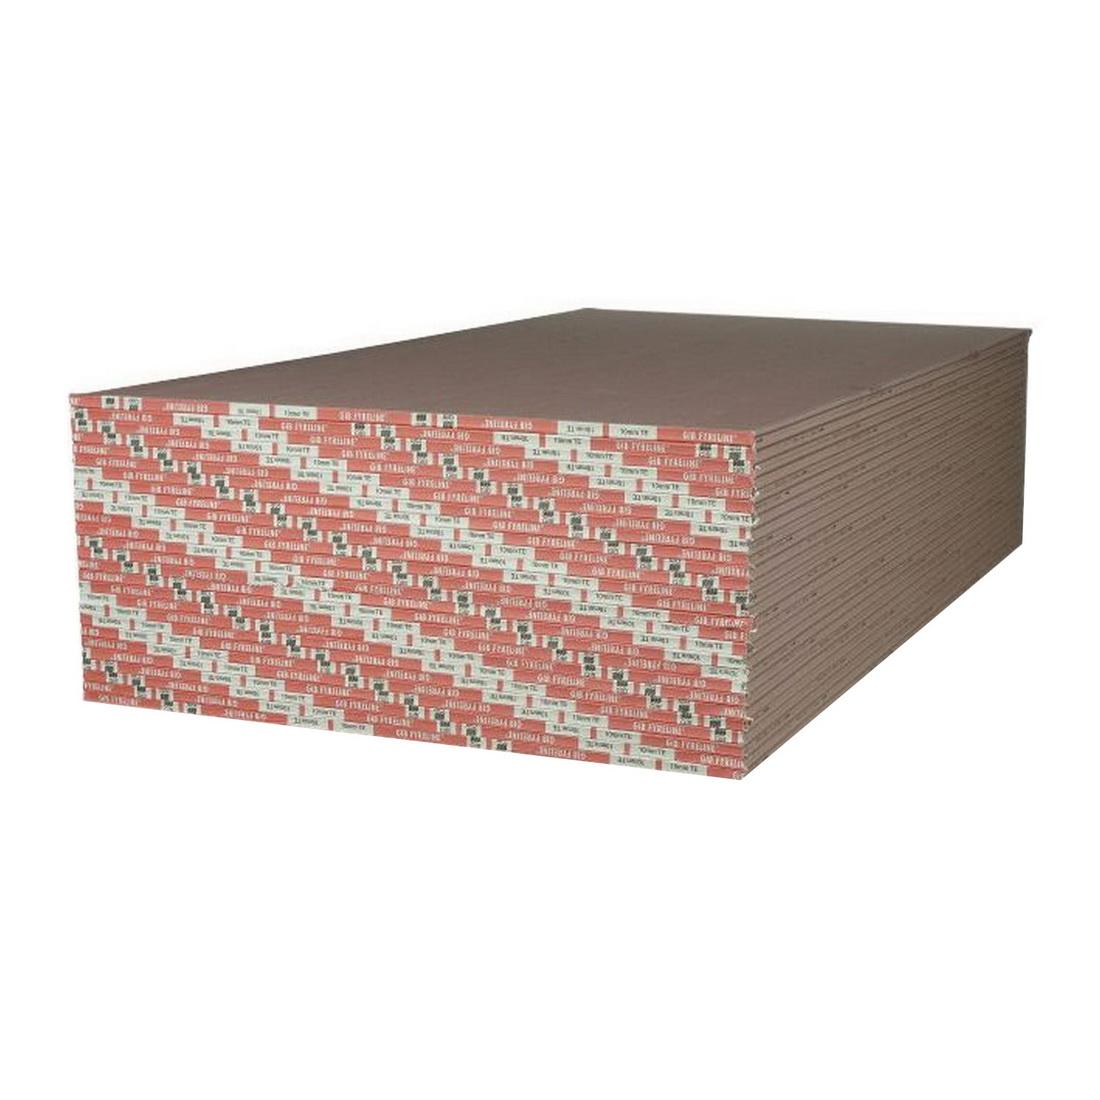 Fyreline Plasterboard 3600 x 1200 x 10mm 11676